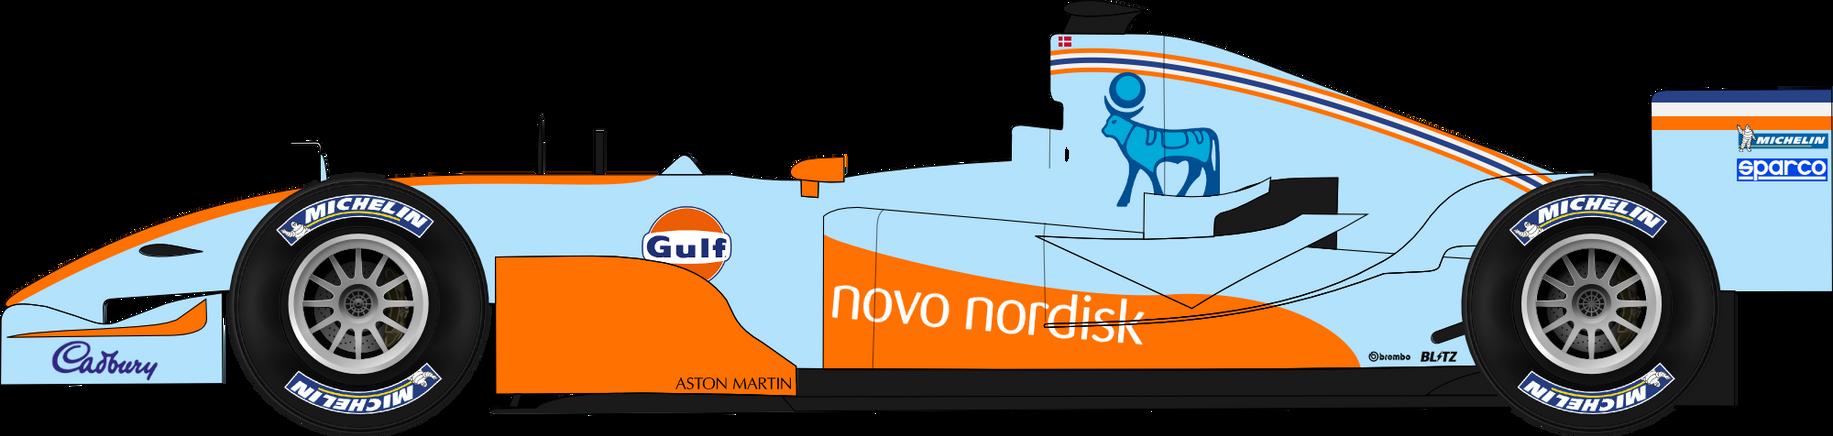 Aston Martin Gulf Racing by rasmv